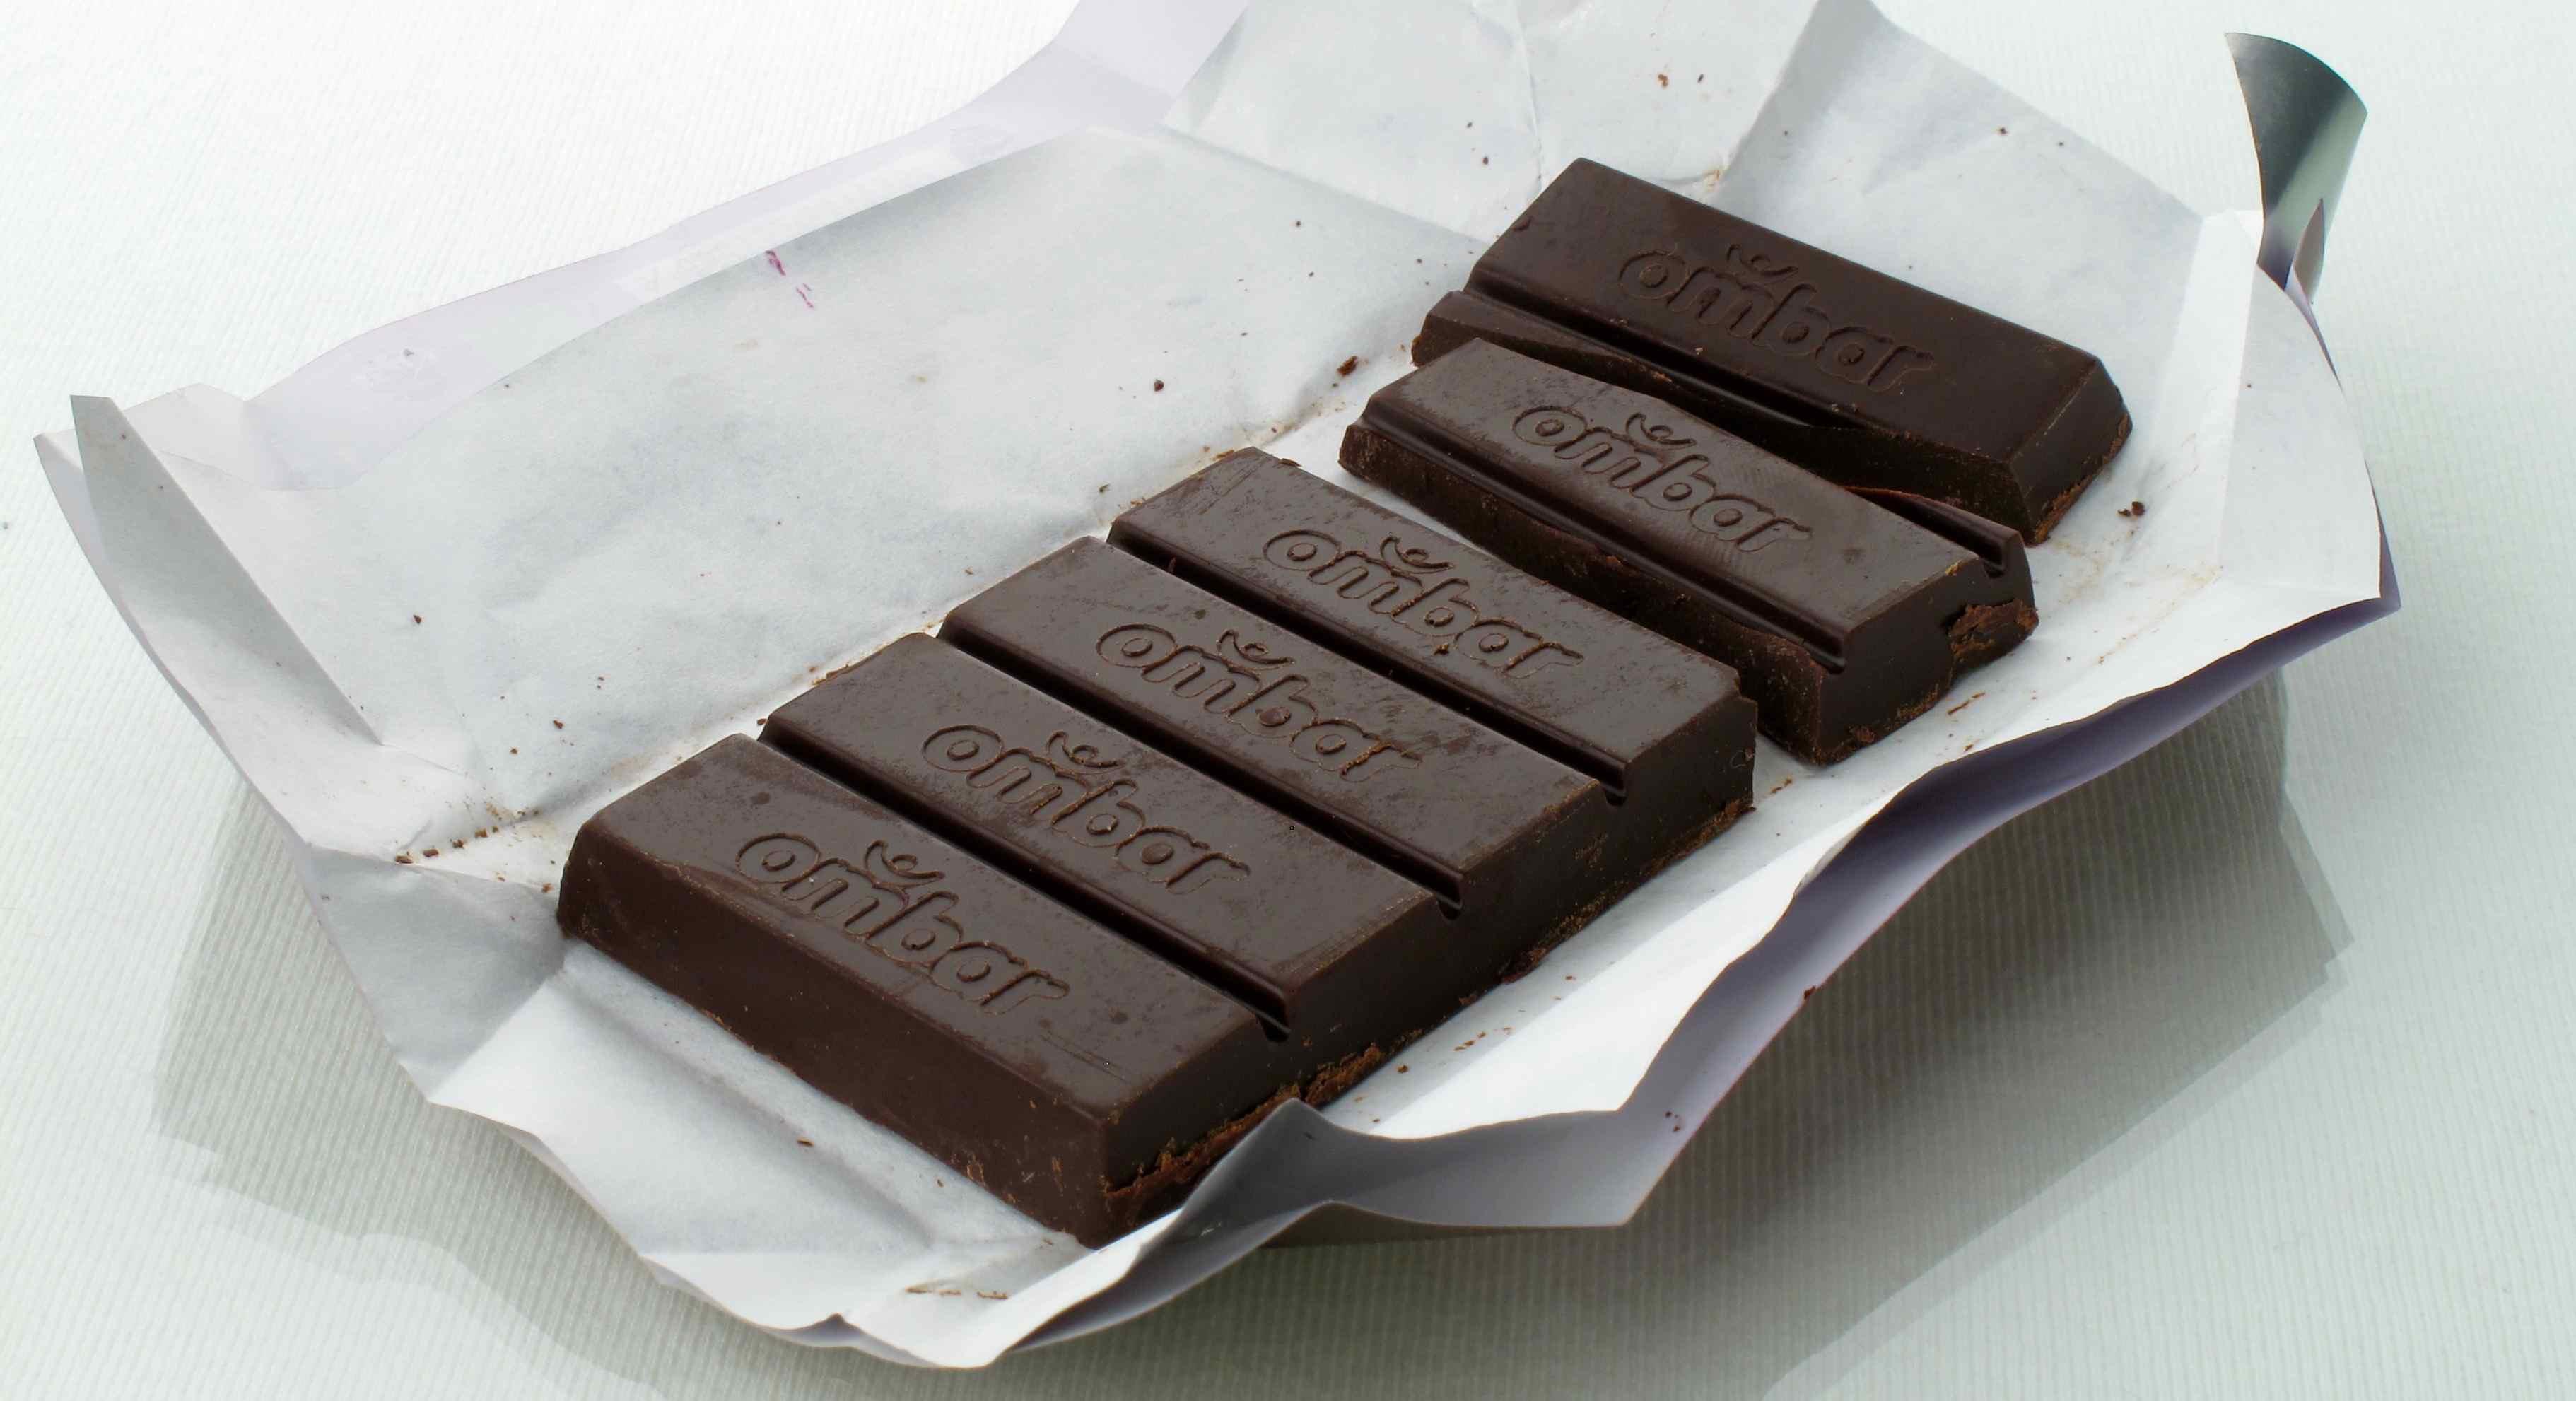 Ombar chocolate acai inside